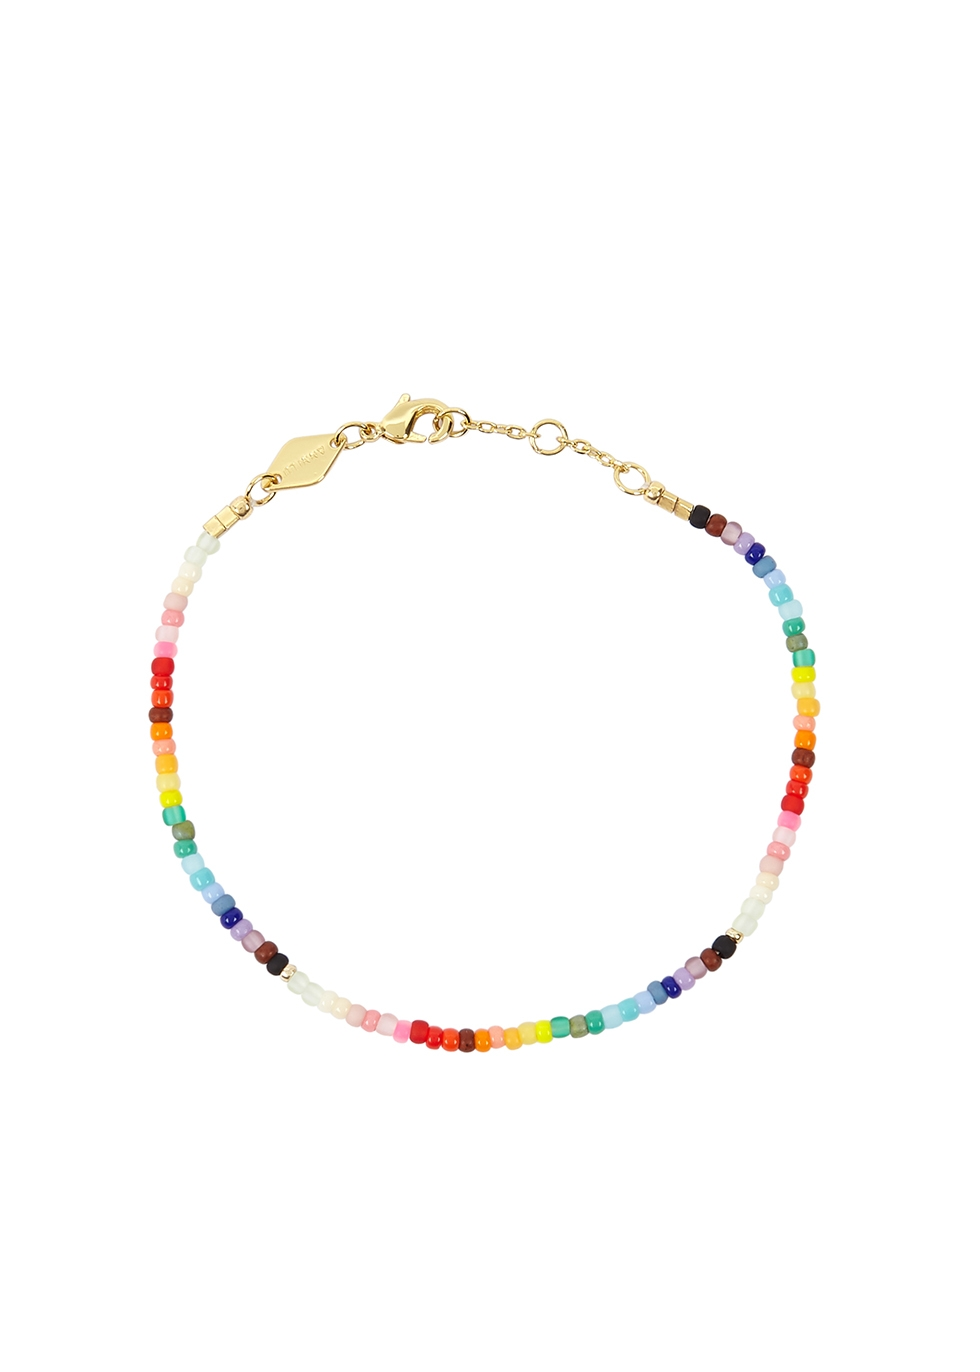 Nuanua beaded bracelet